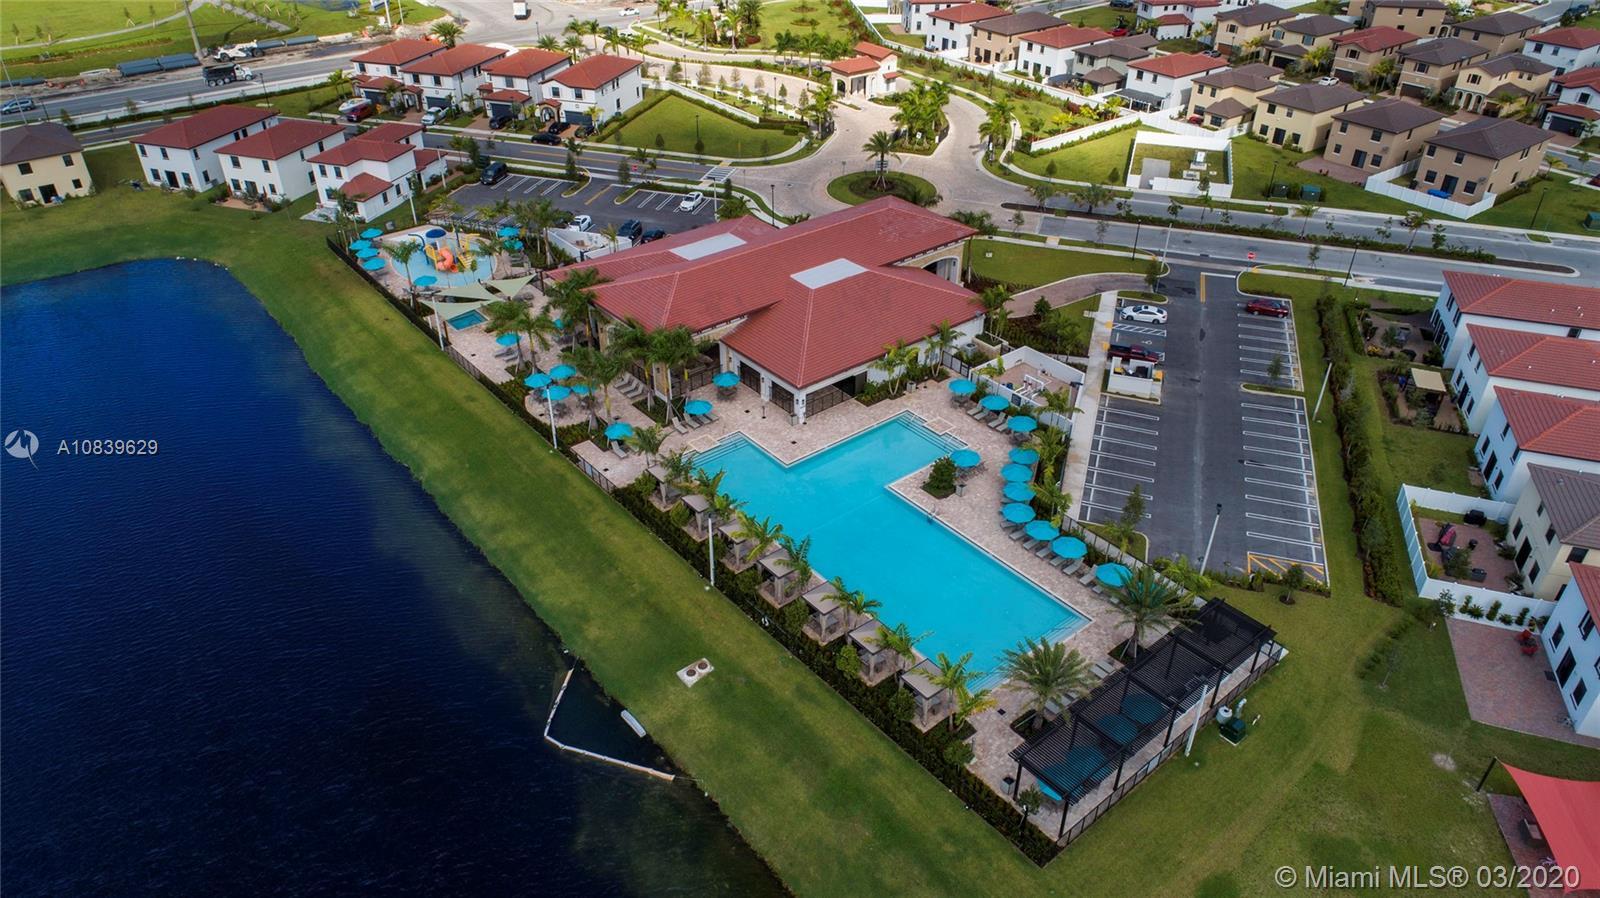 3462 W 106 TERR # 0, Hialeah Gardens, Florida 33018, 3 Bedrooms Bedrooms, 1 Room Rooms,3 BathroomsBathrooms,Residential,For Sale,3462 W 106 TERR # 0,A10839629